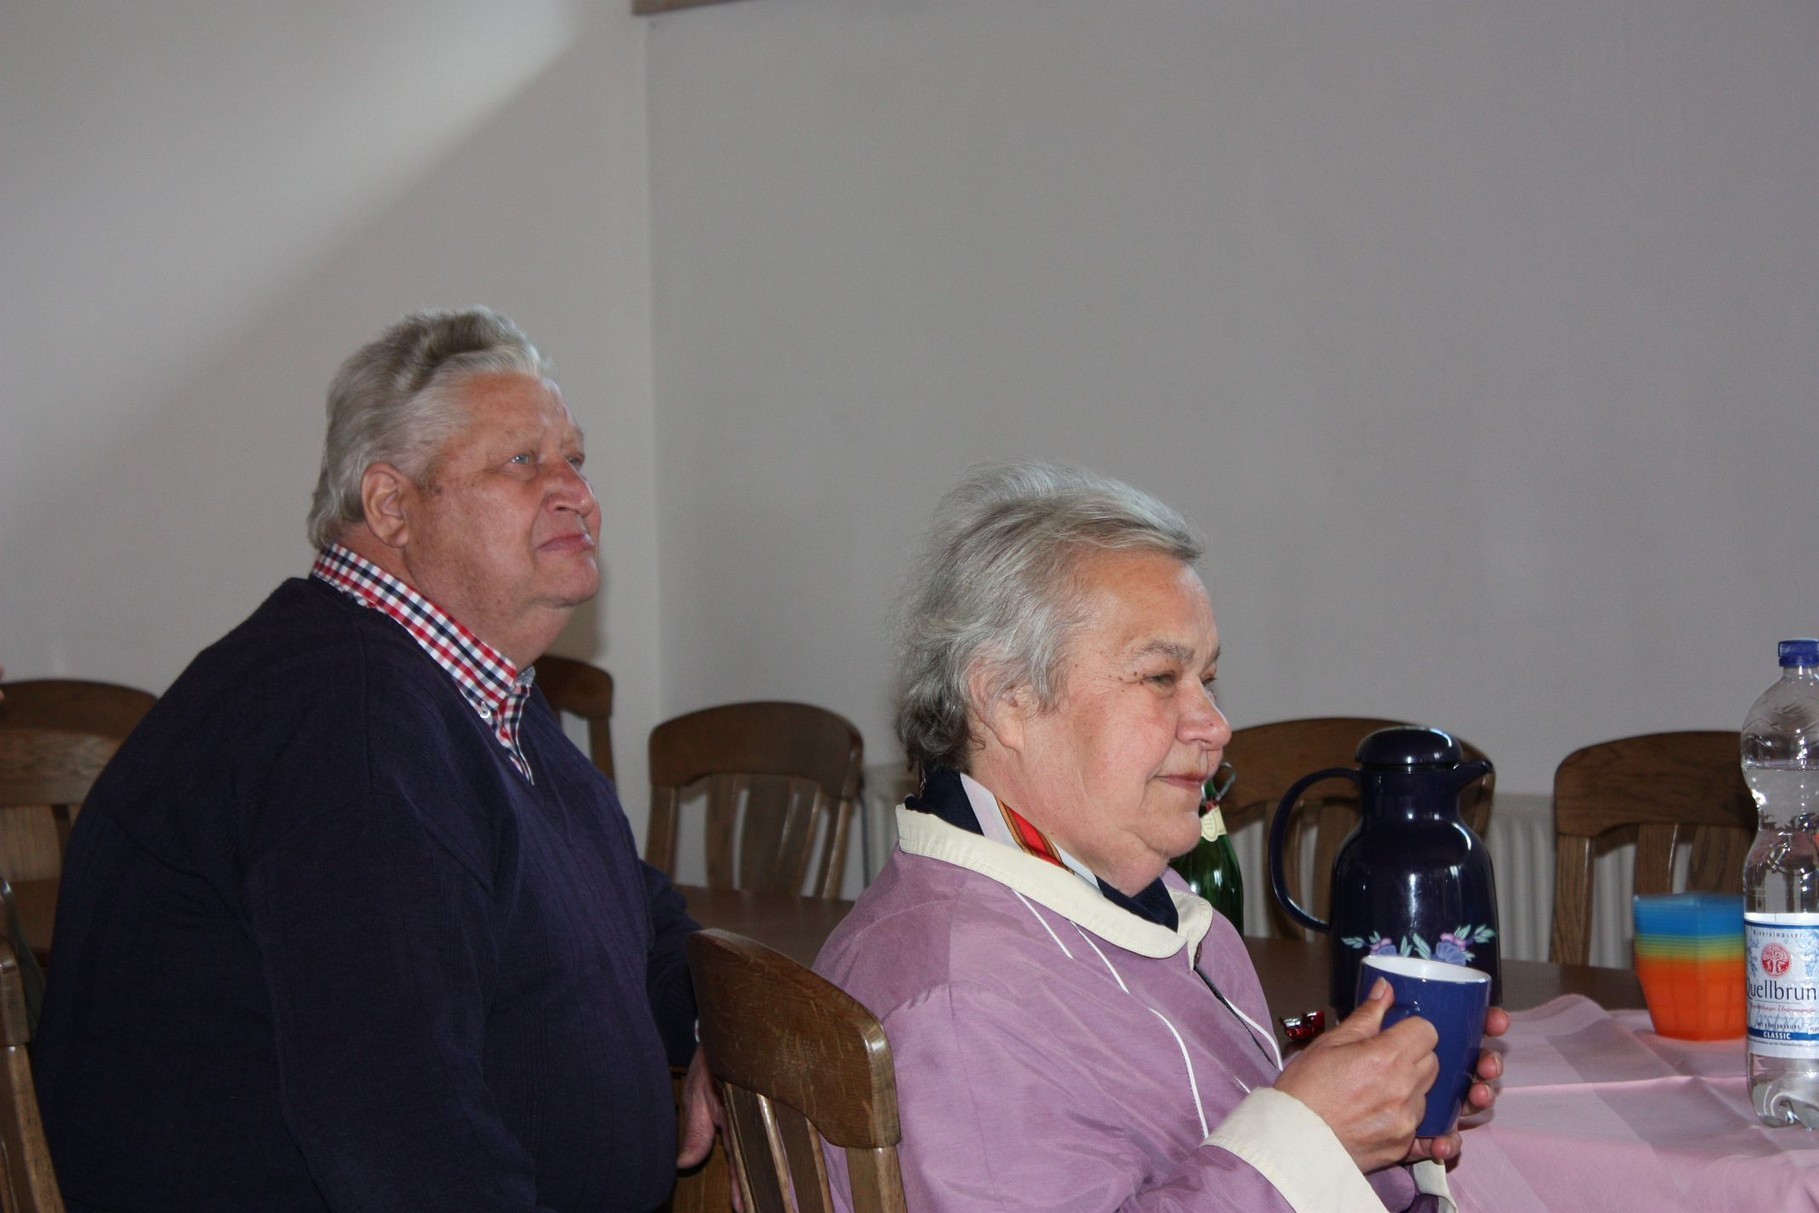 Ausklang in Kyritz